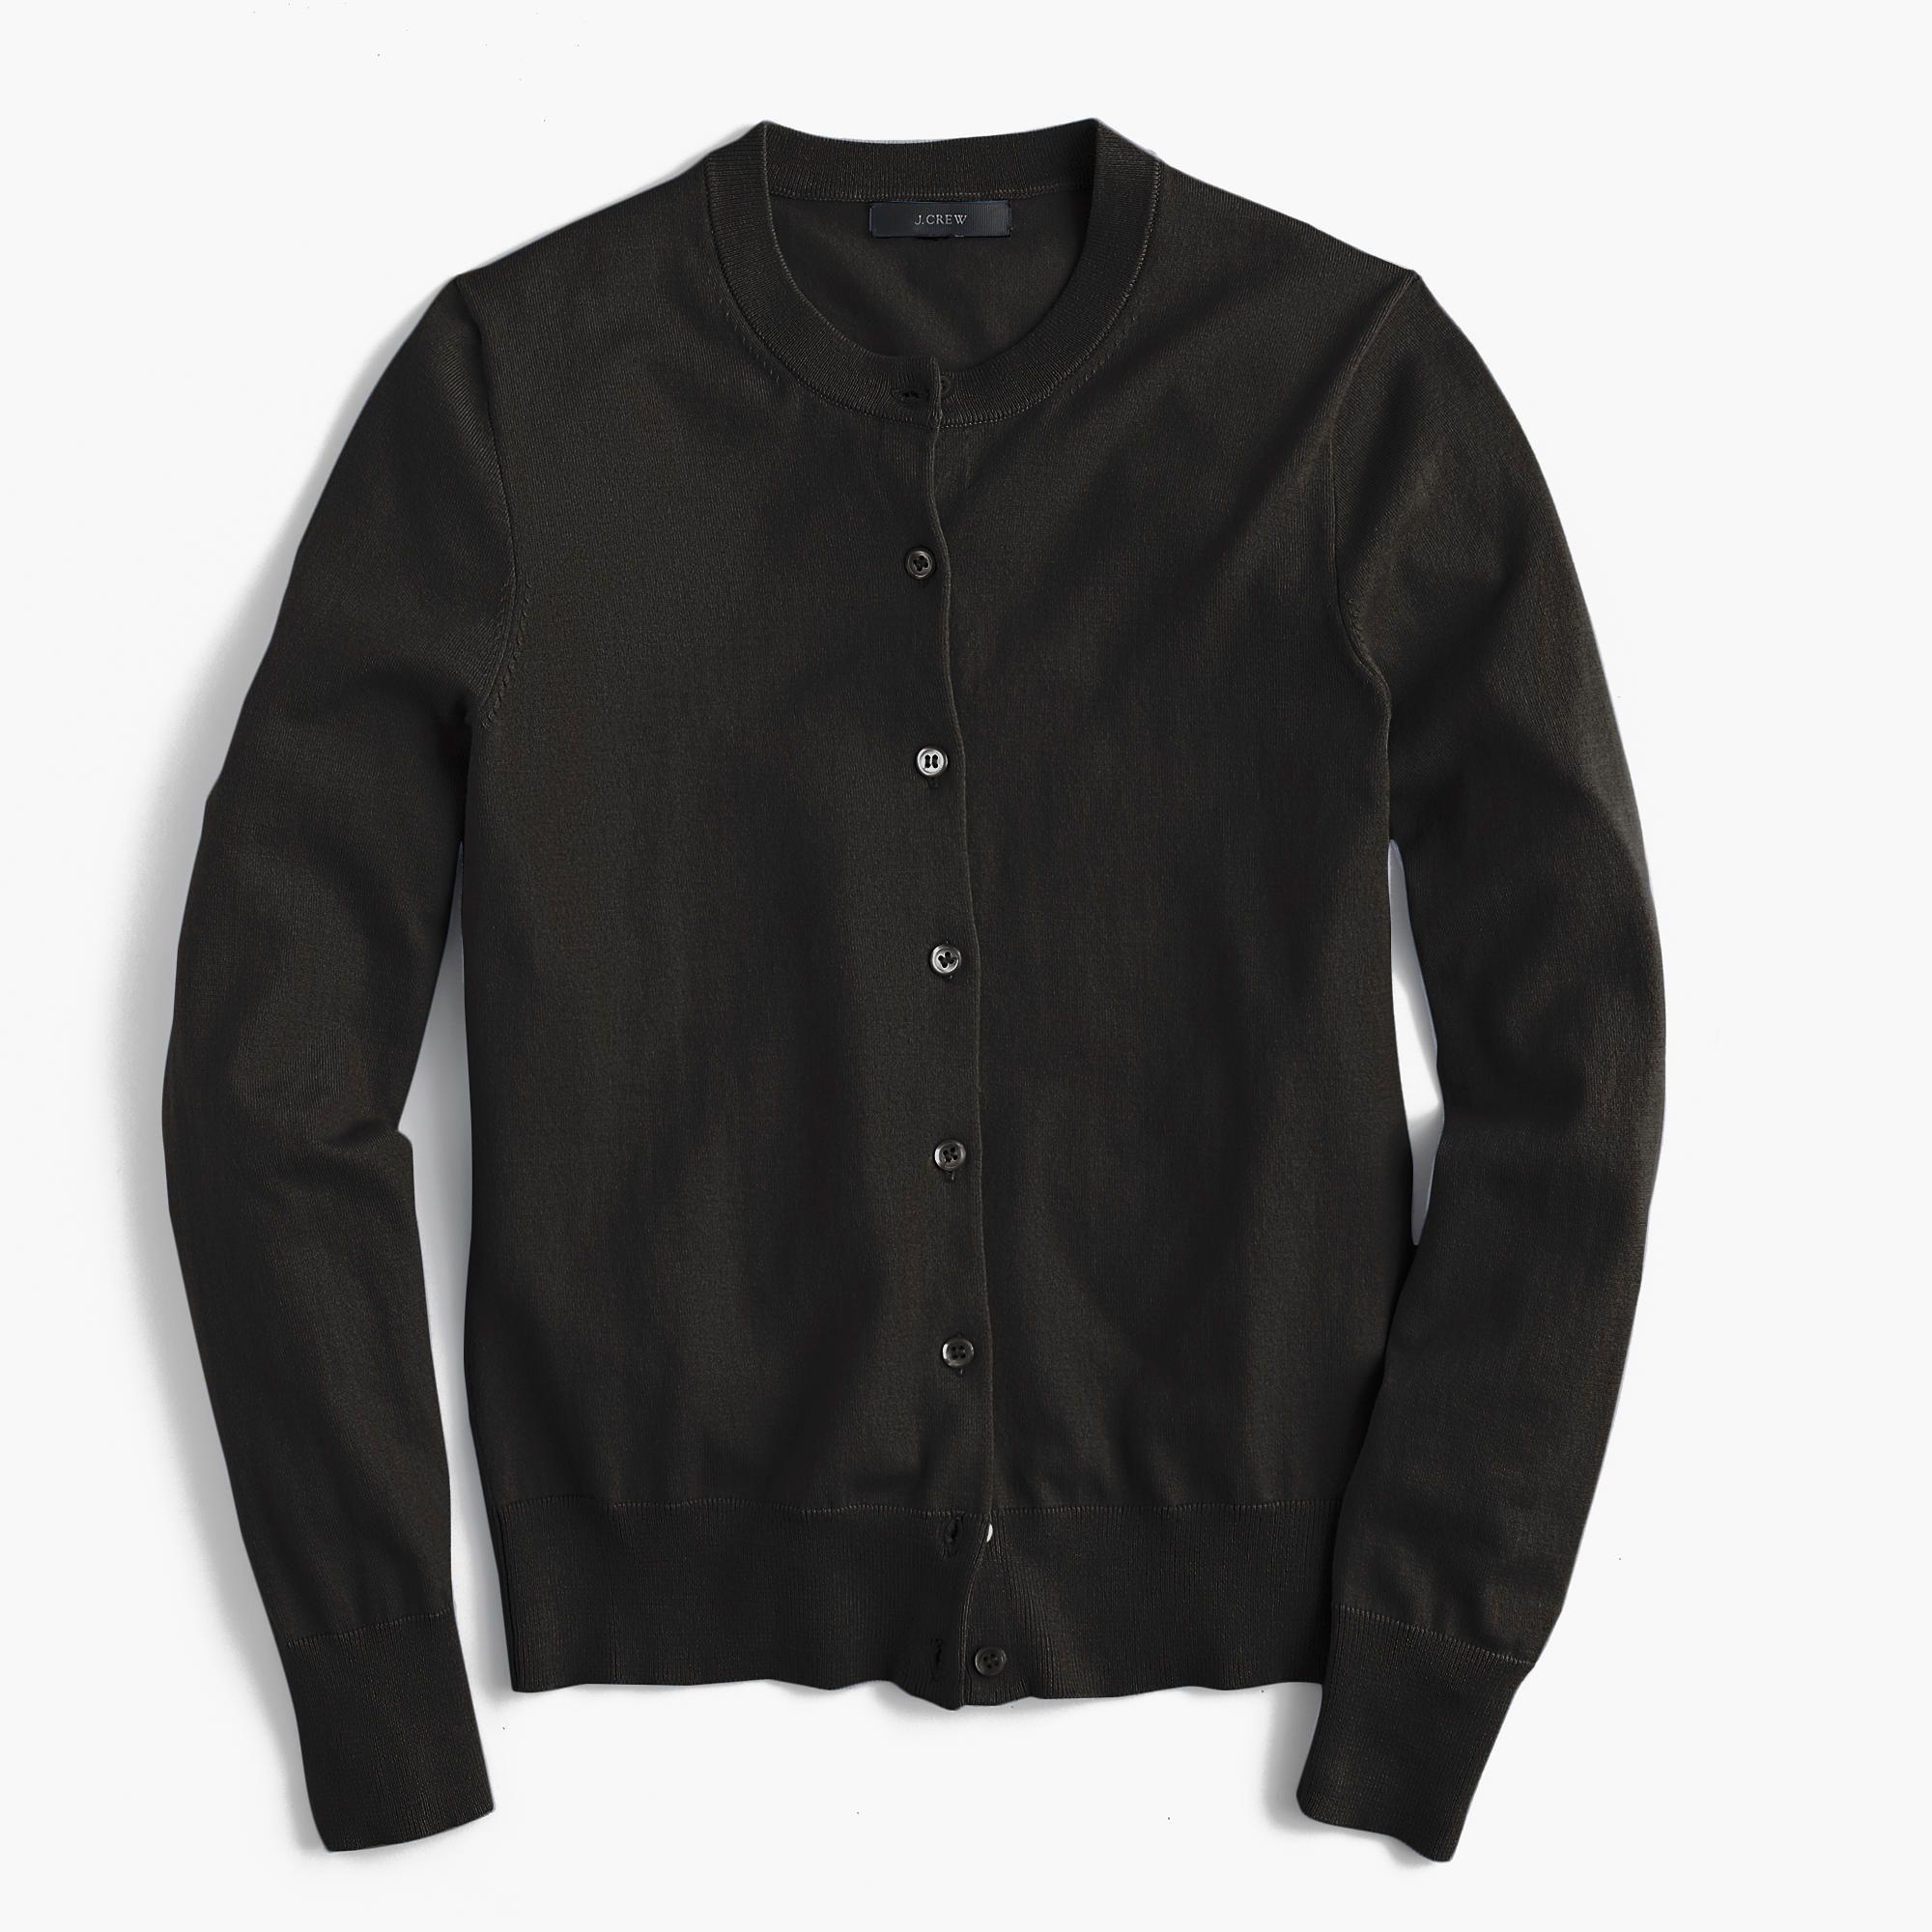 Cotton Jackie cardigan sweater : Cardigans & Shells | J.Crew ...